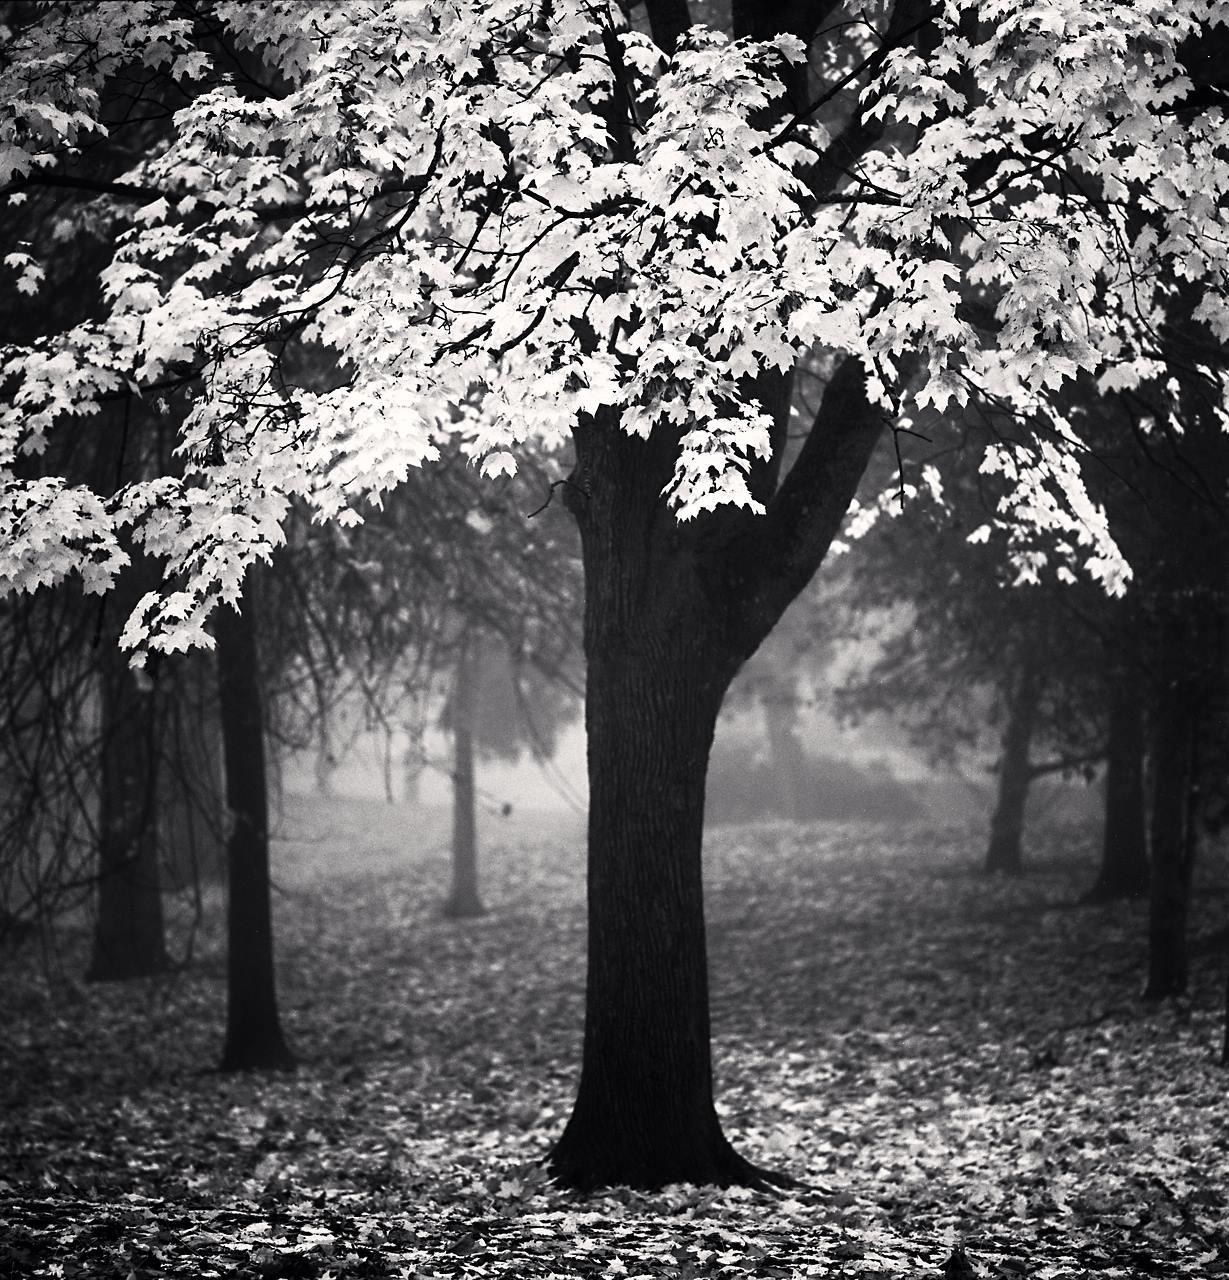 Irving Park Tree, Study 2, Portland, Oregon, USA